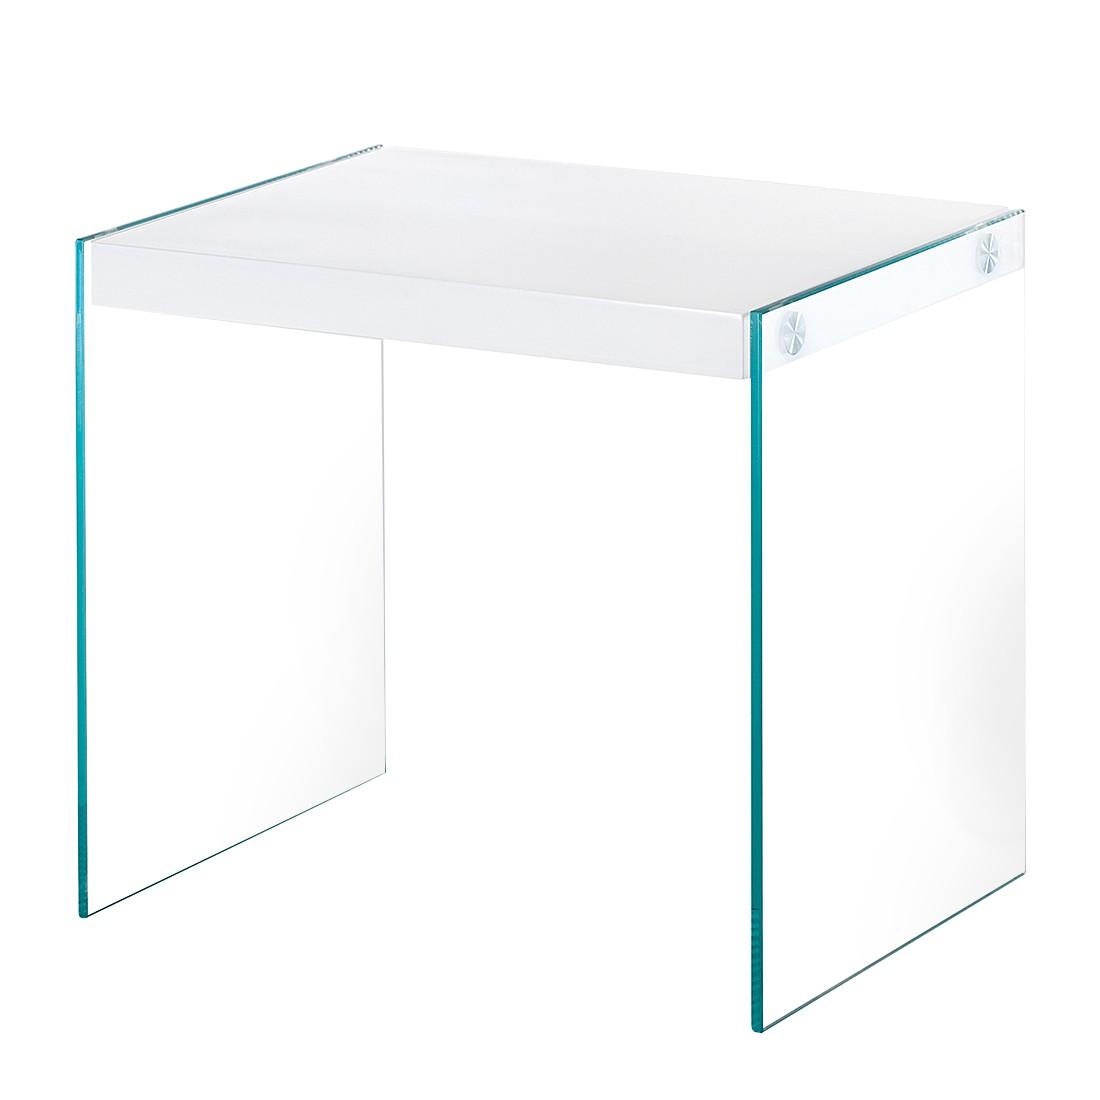 Table d'appoint Savoie